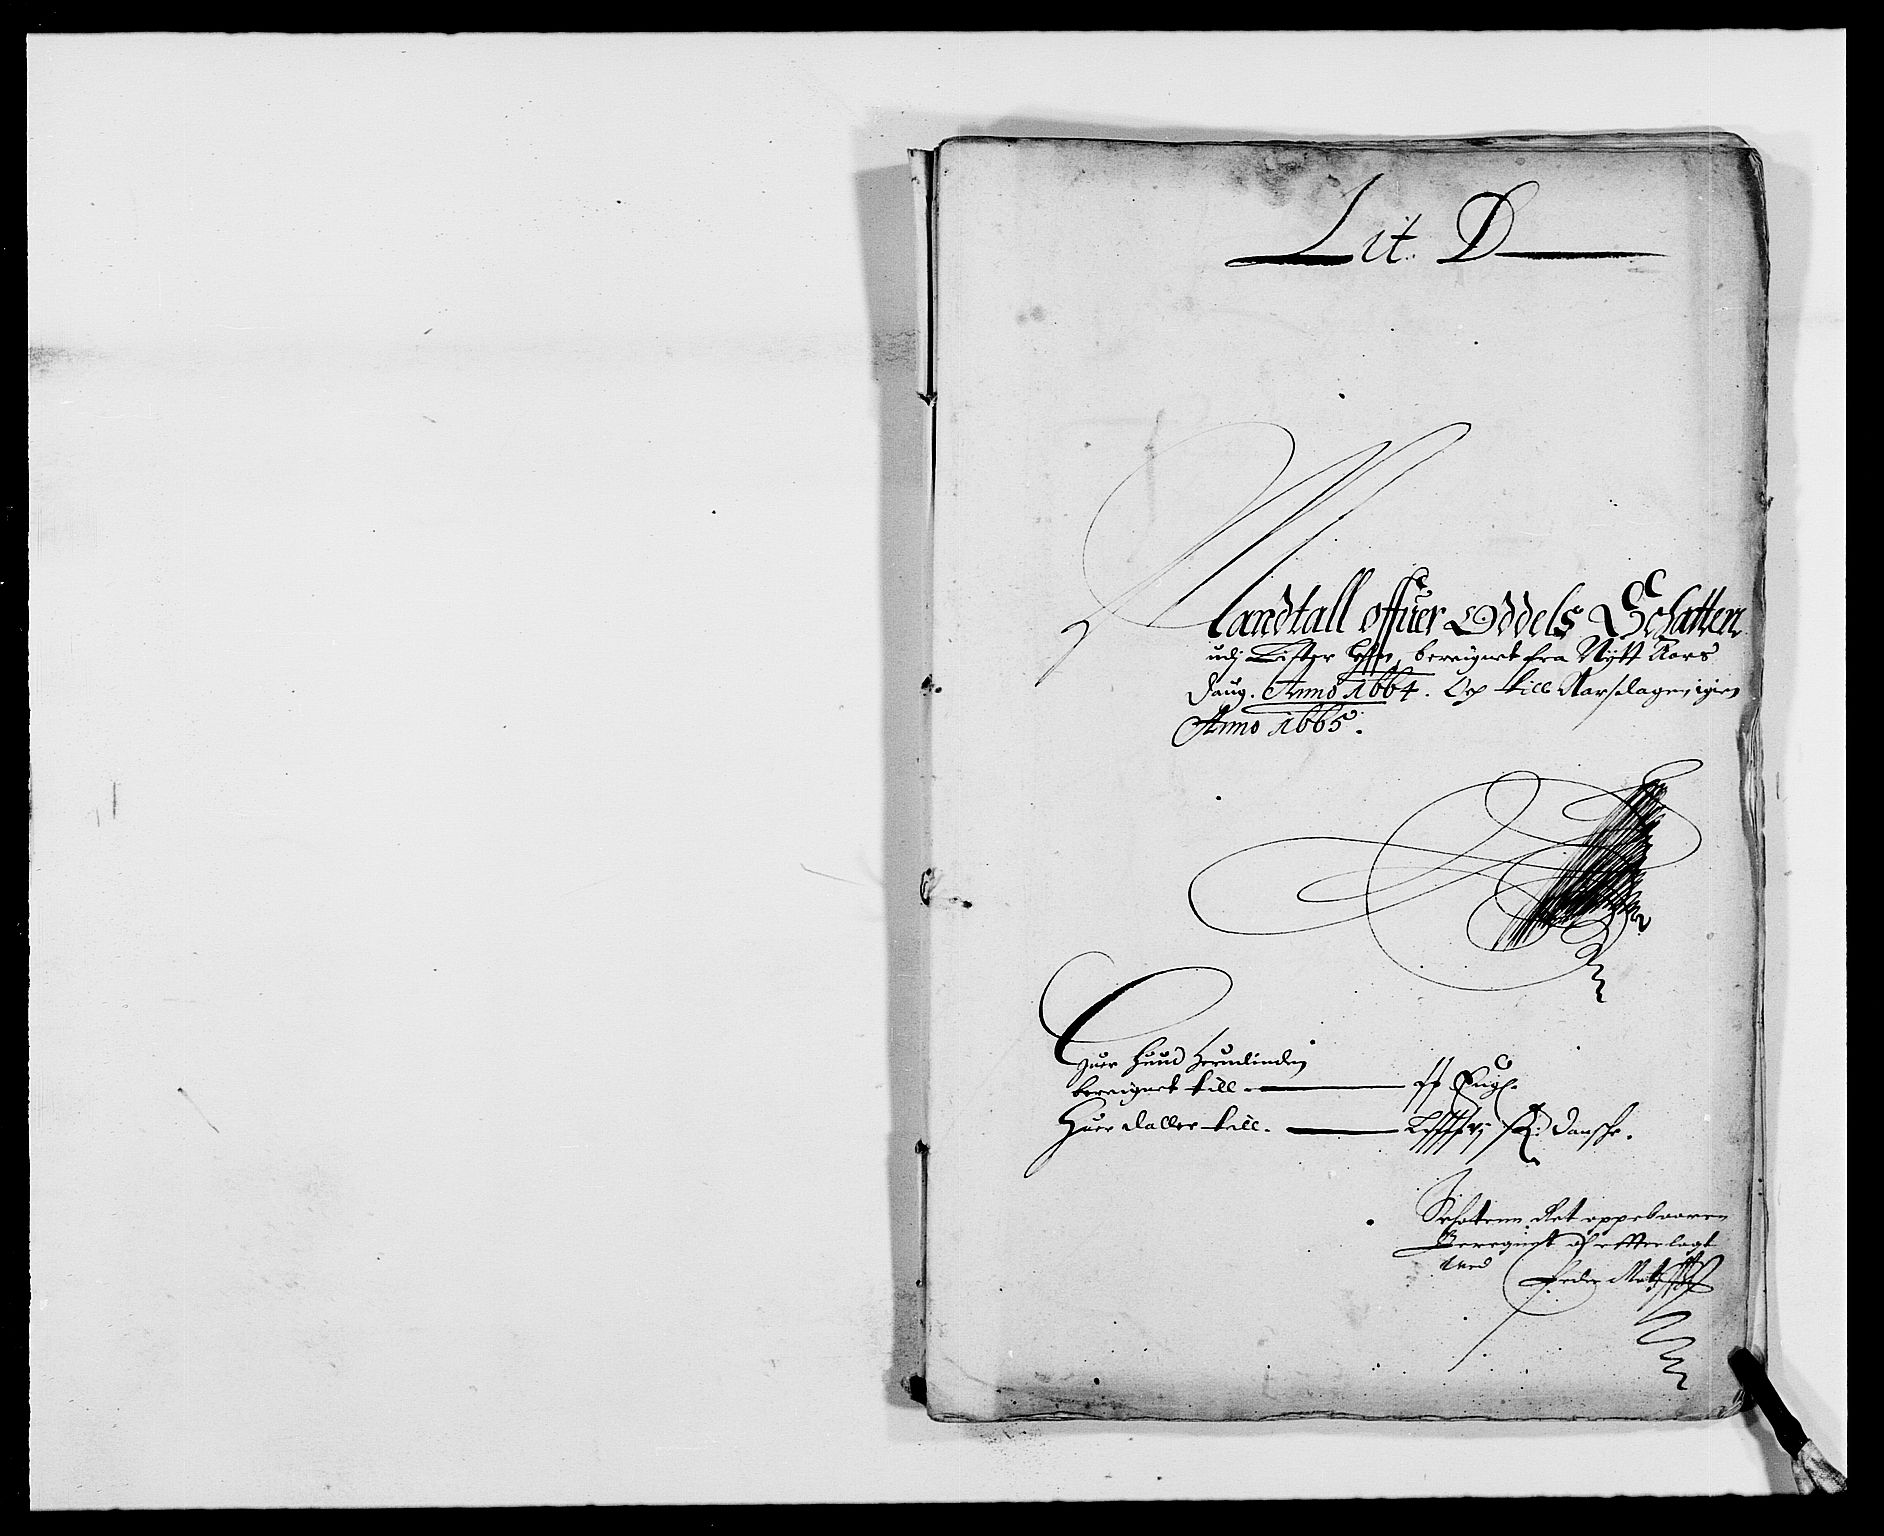 RA, Rentekammeret inntil 1814, Reviderte regnskaper, Fogderegnskap, R41/L2523: Fogderegnskap Lista, 1663-1664, s. 269